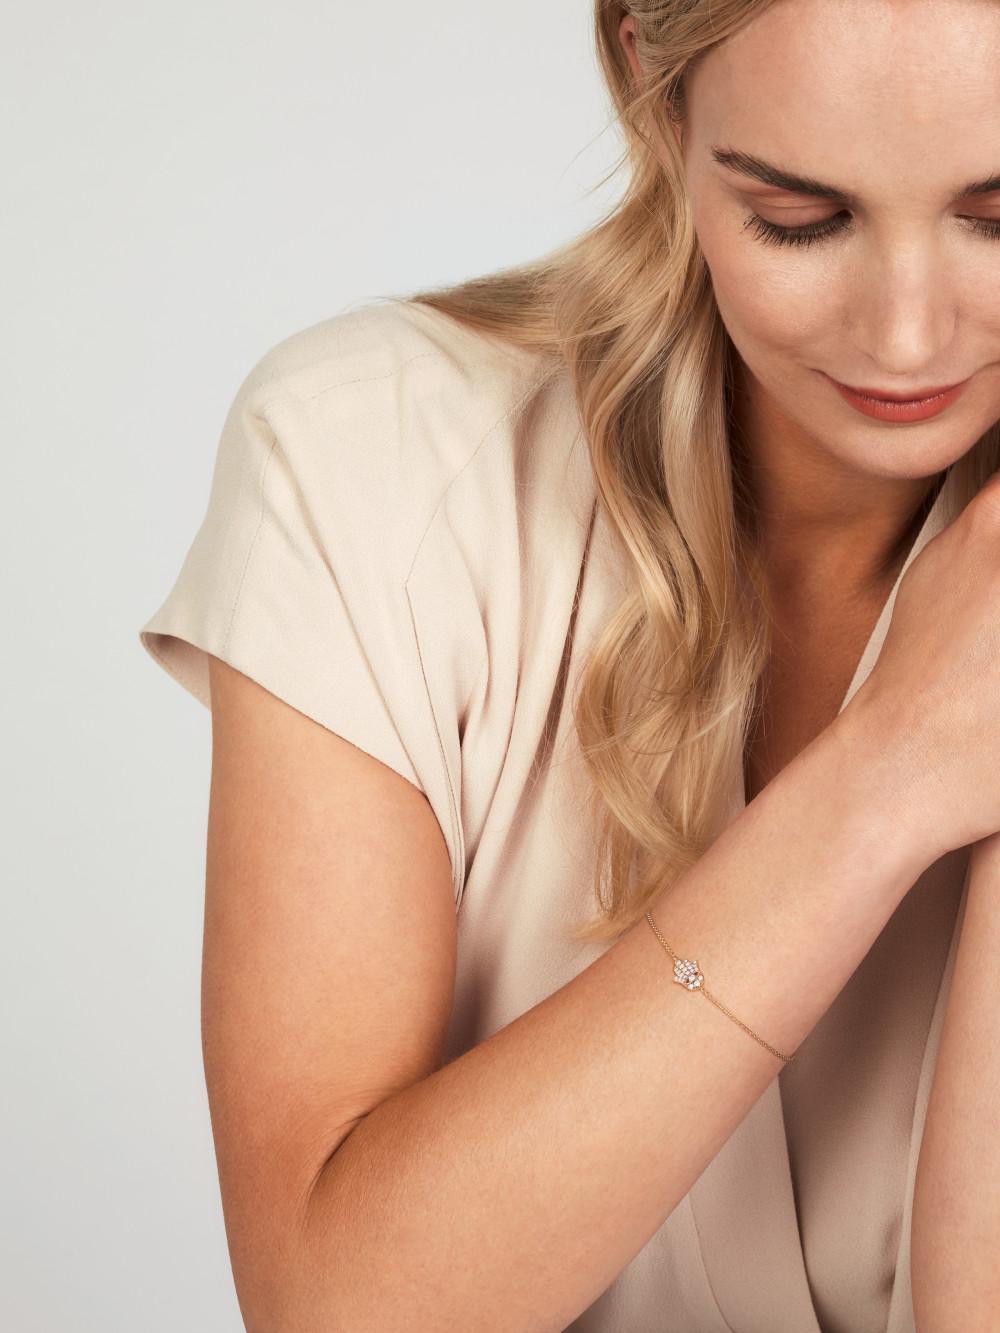 Armband Minimalism Hand 02